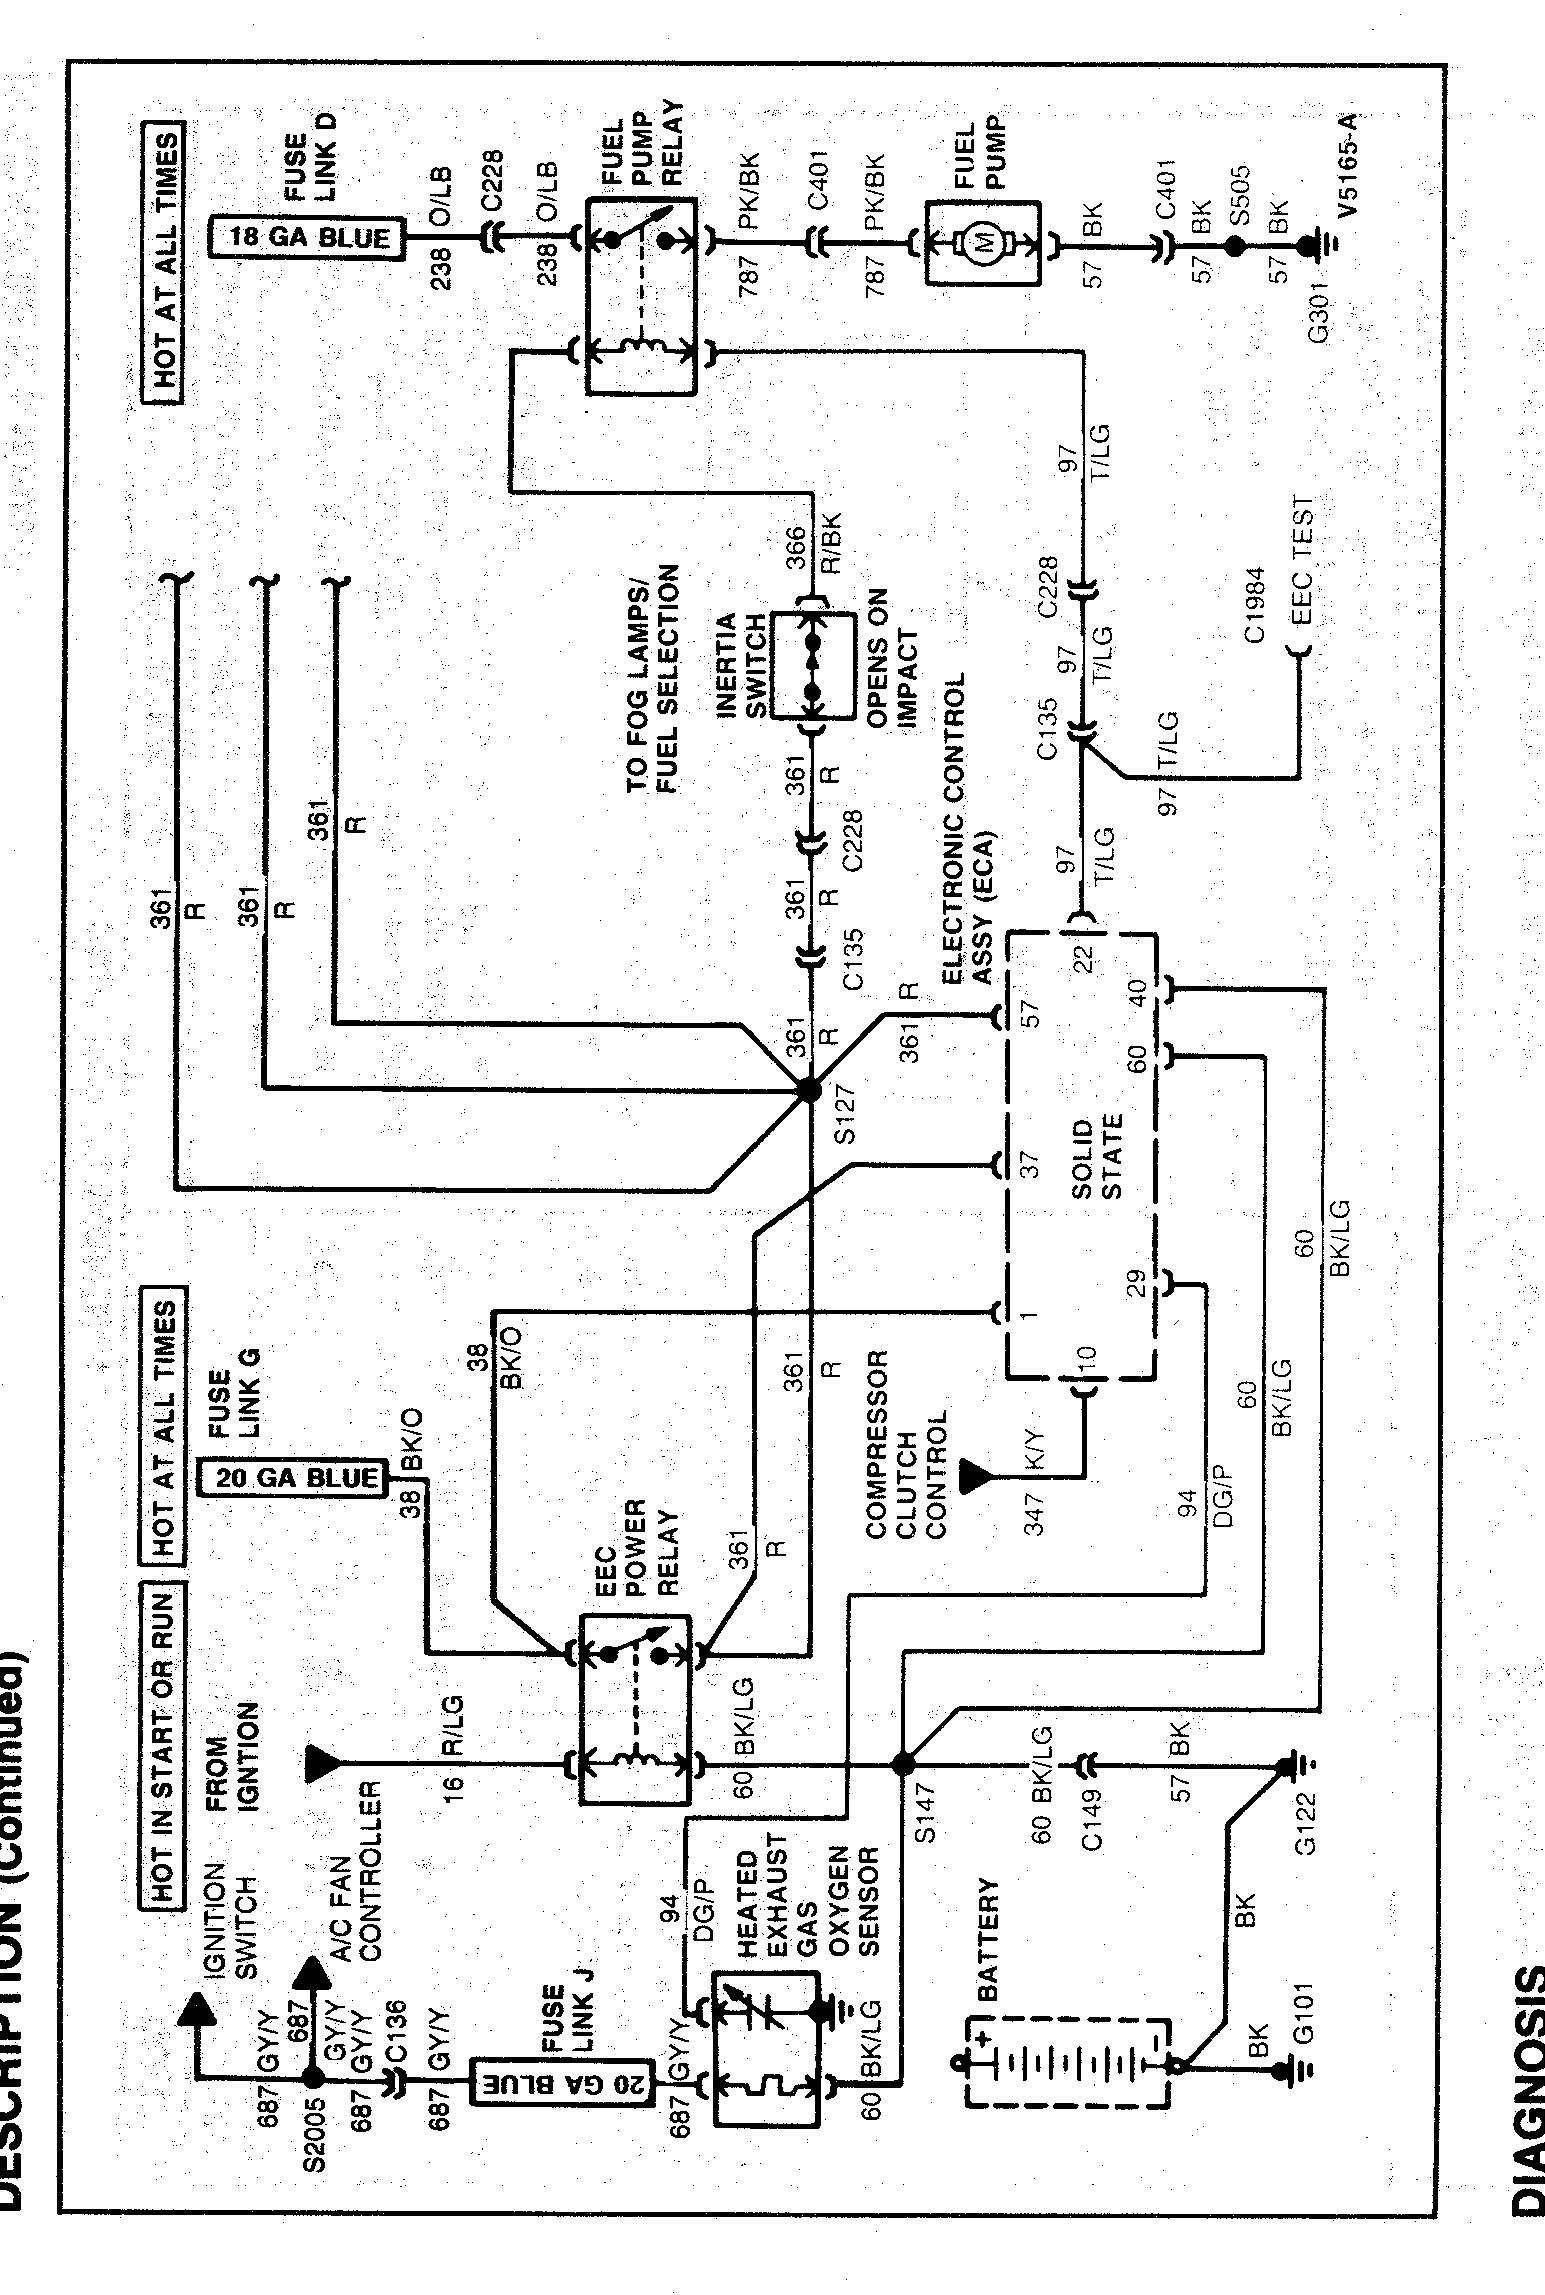 troy bilt engine wiring diagram mustang 5 0 engine diagram e1 wiring diagram  mustang 5 0 engine diagram e1 wiring